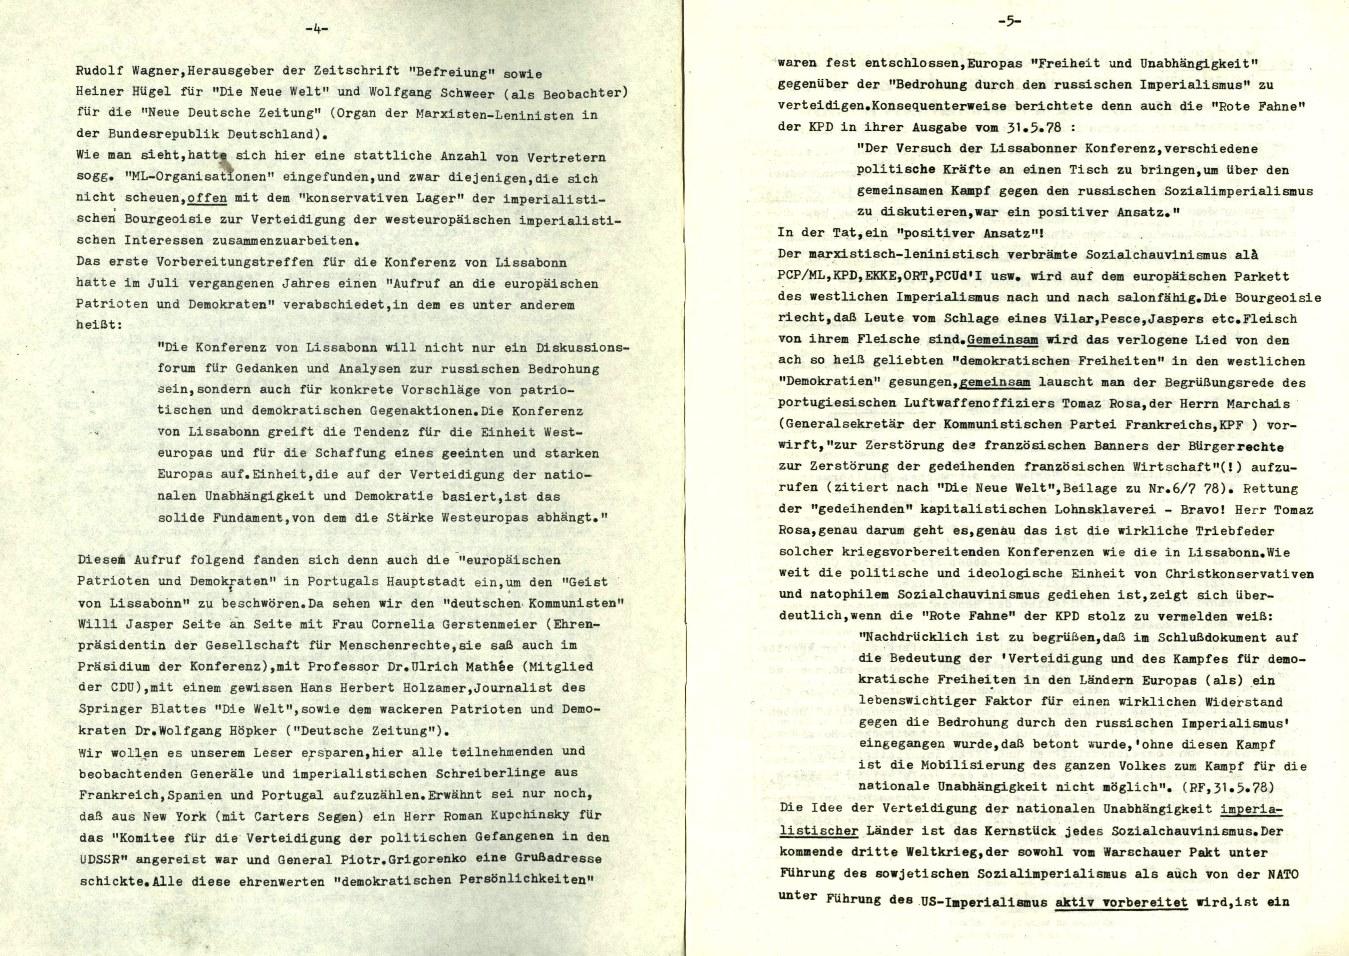 Muenchen_Kampf_dem_Revisionismus_1978_07_03